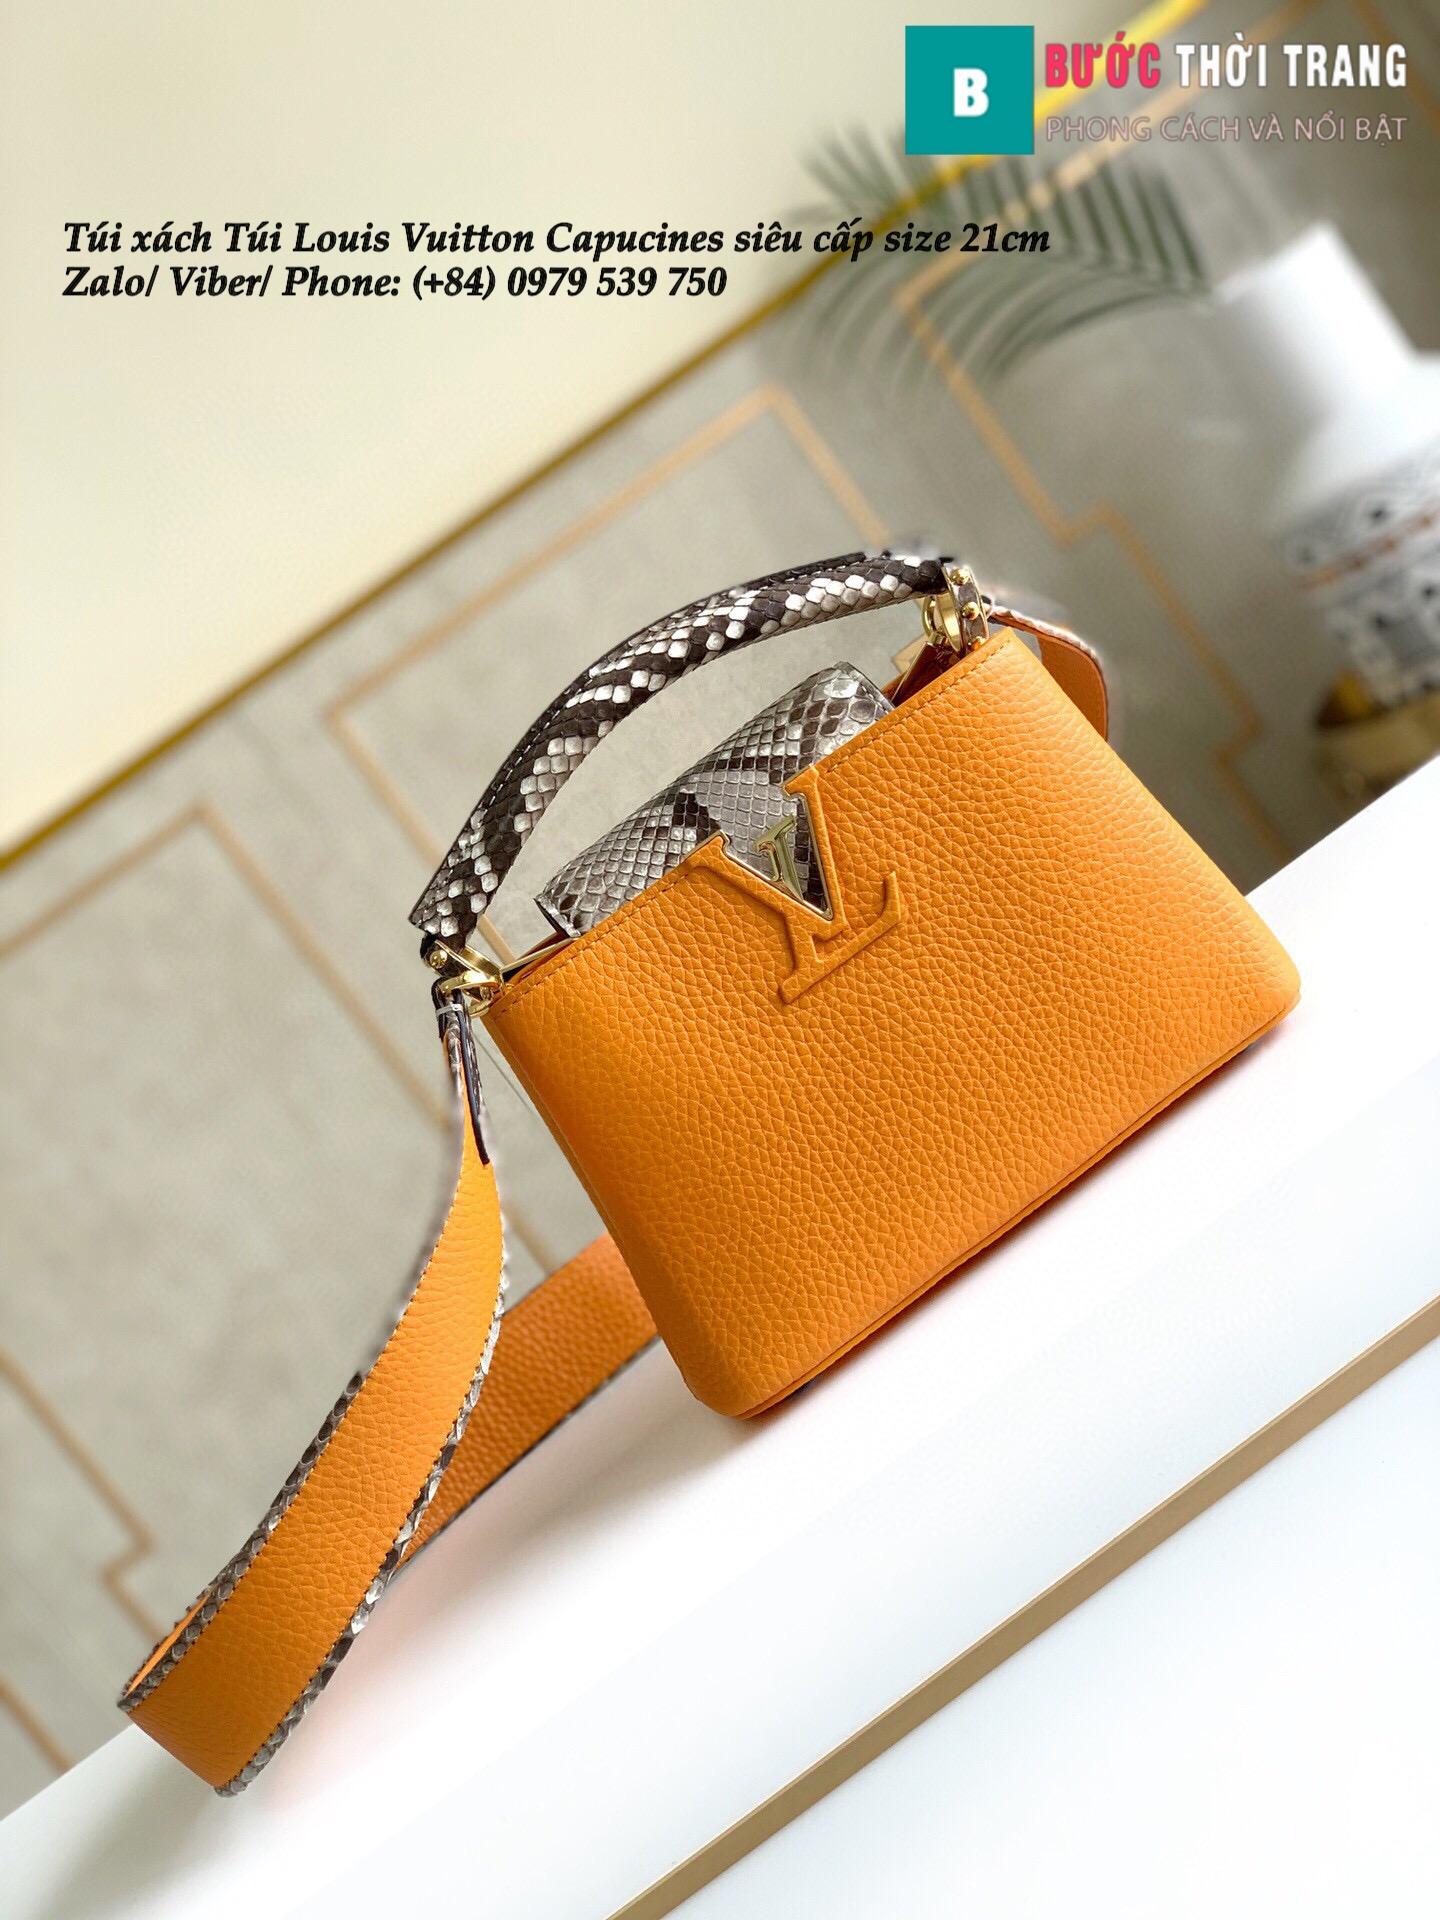 Túi Louis Vuitton Capucines siêu cấp quai da trăn size 21cm – M95509 (46)